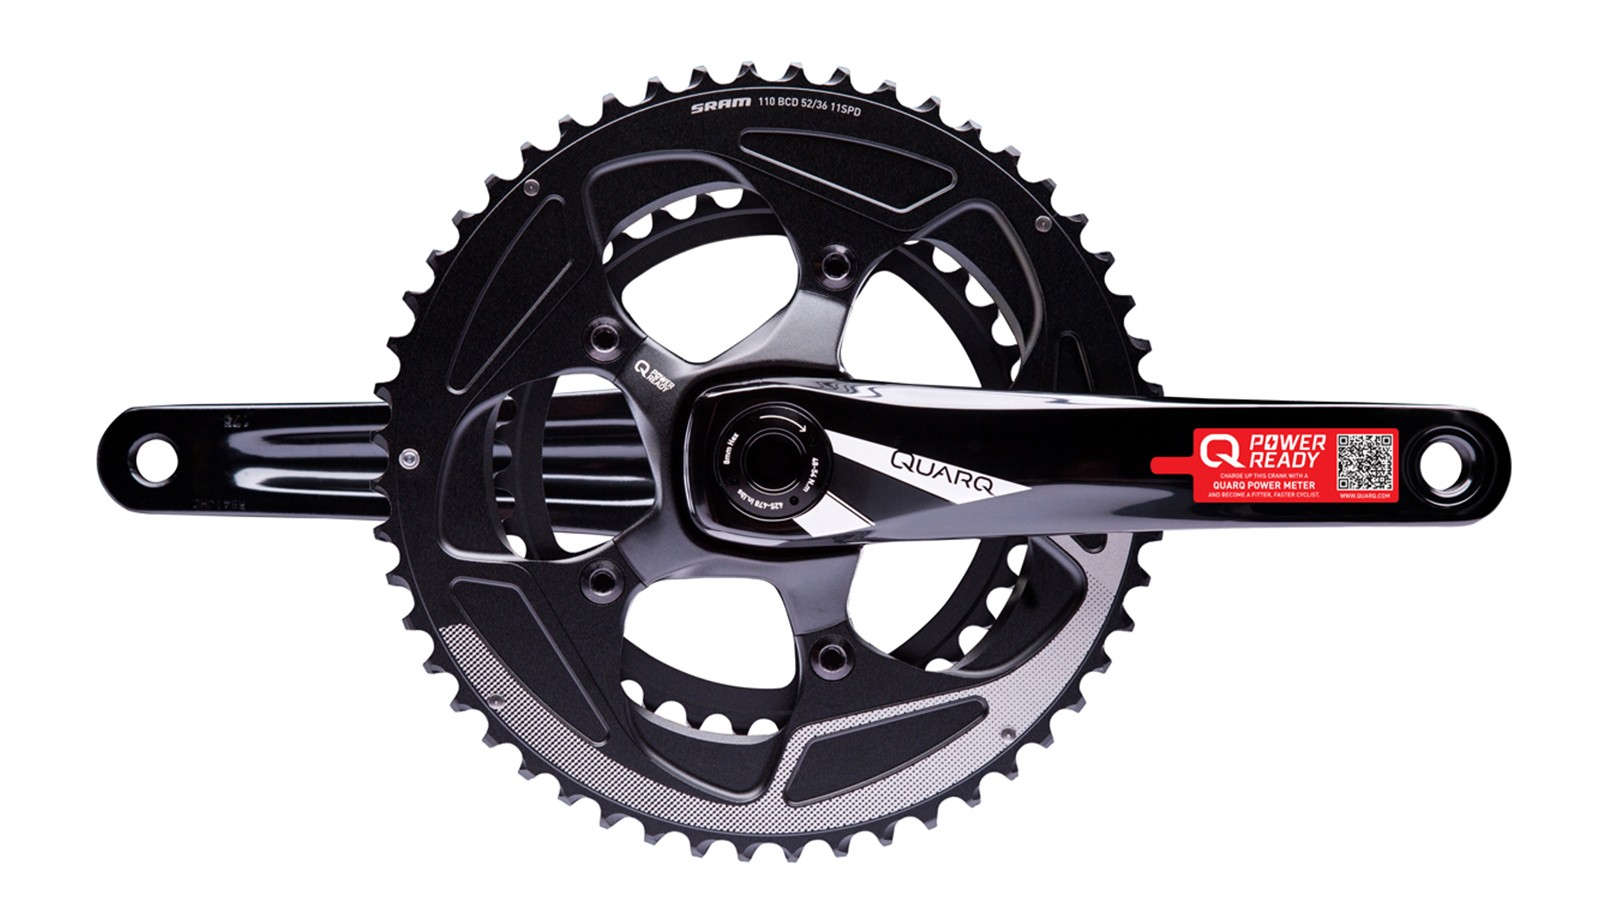 The new Quarq Prime 'power-ready' crankset